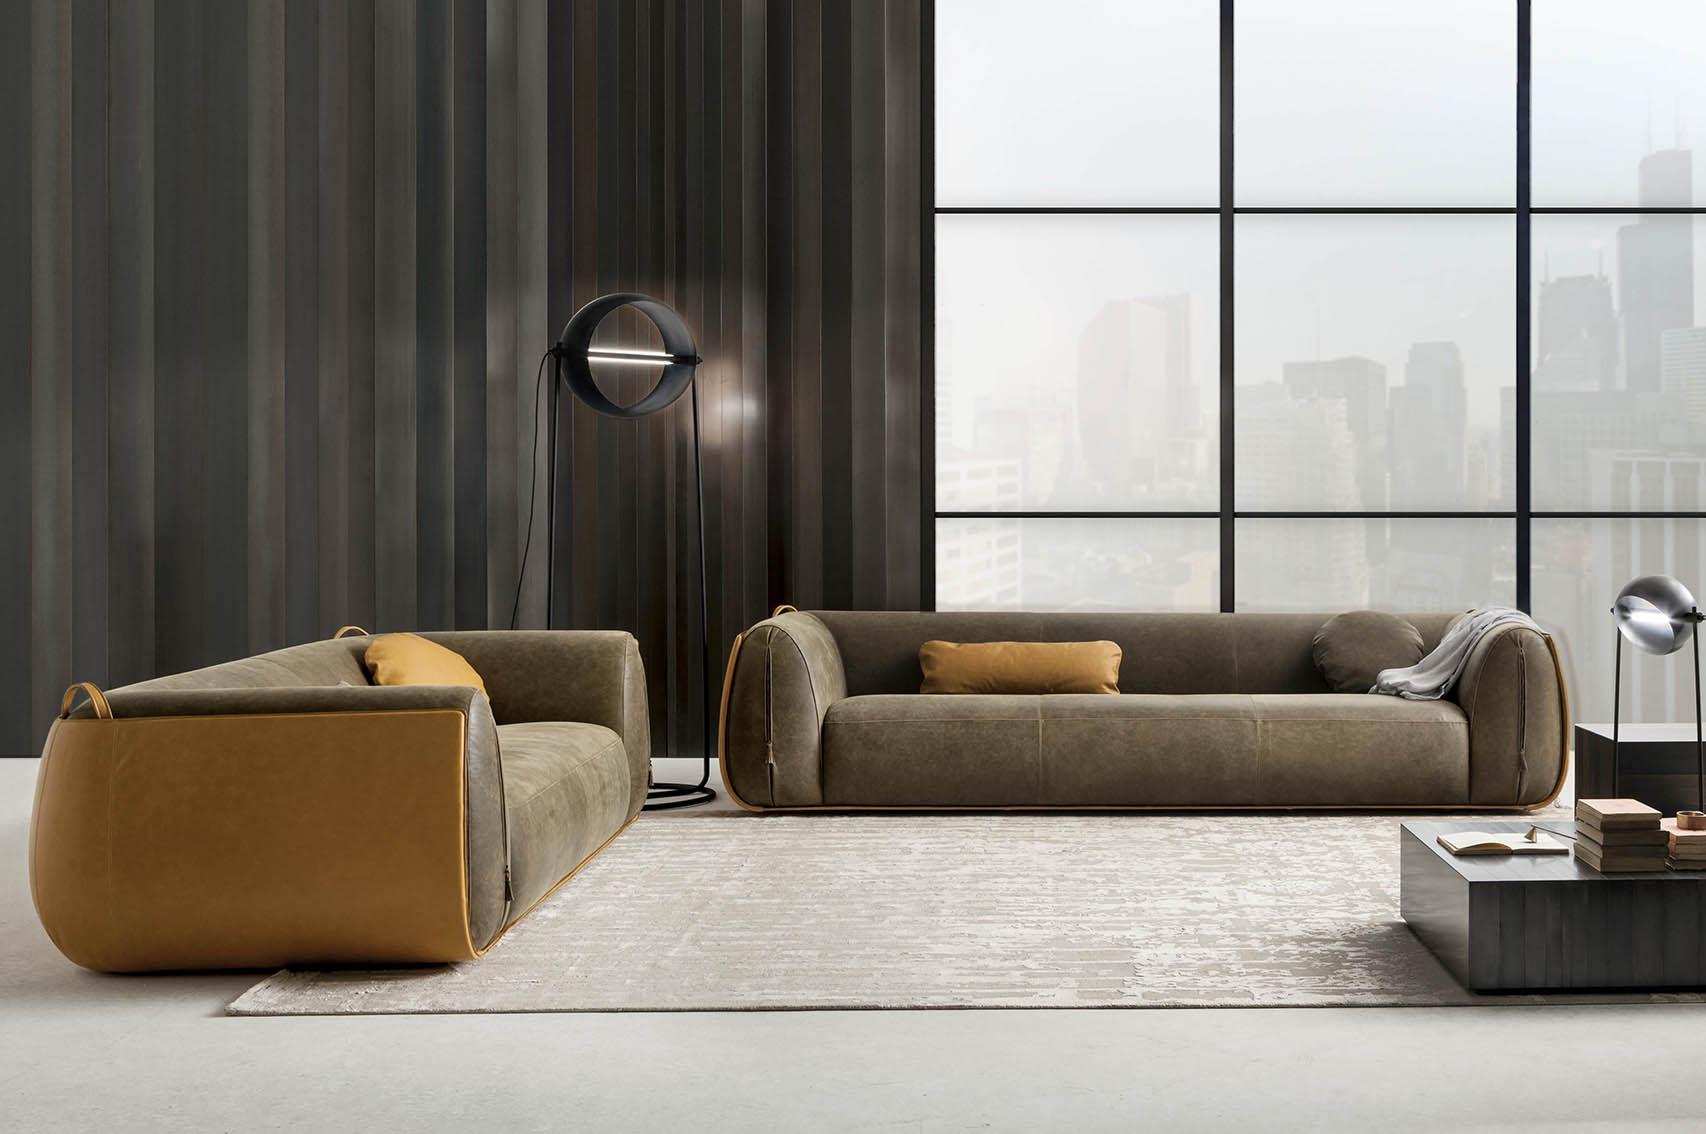 Laurameroni luxury modern designer floor lamps in copper or brass and fine metals for contemporary interior decor and design